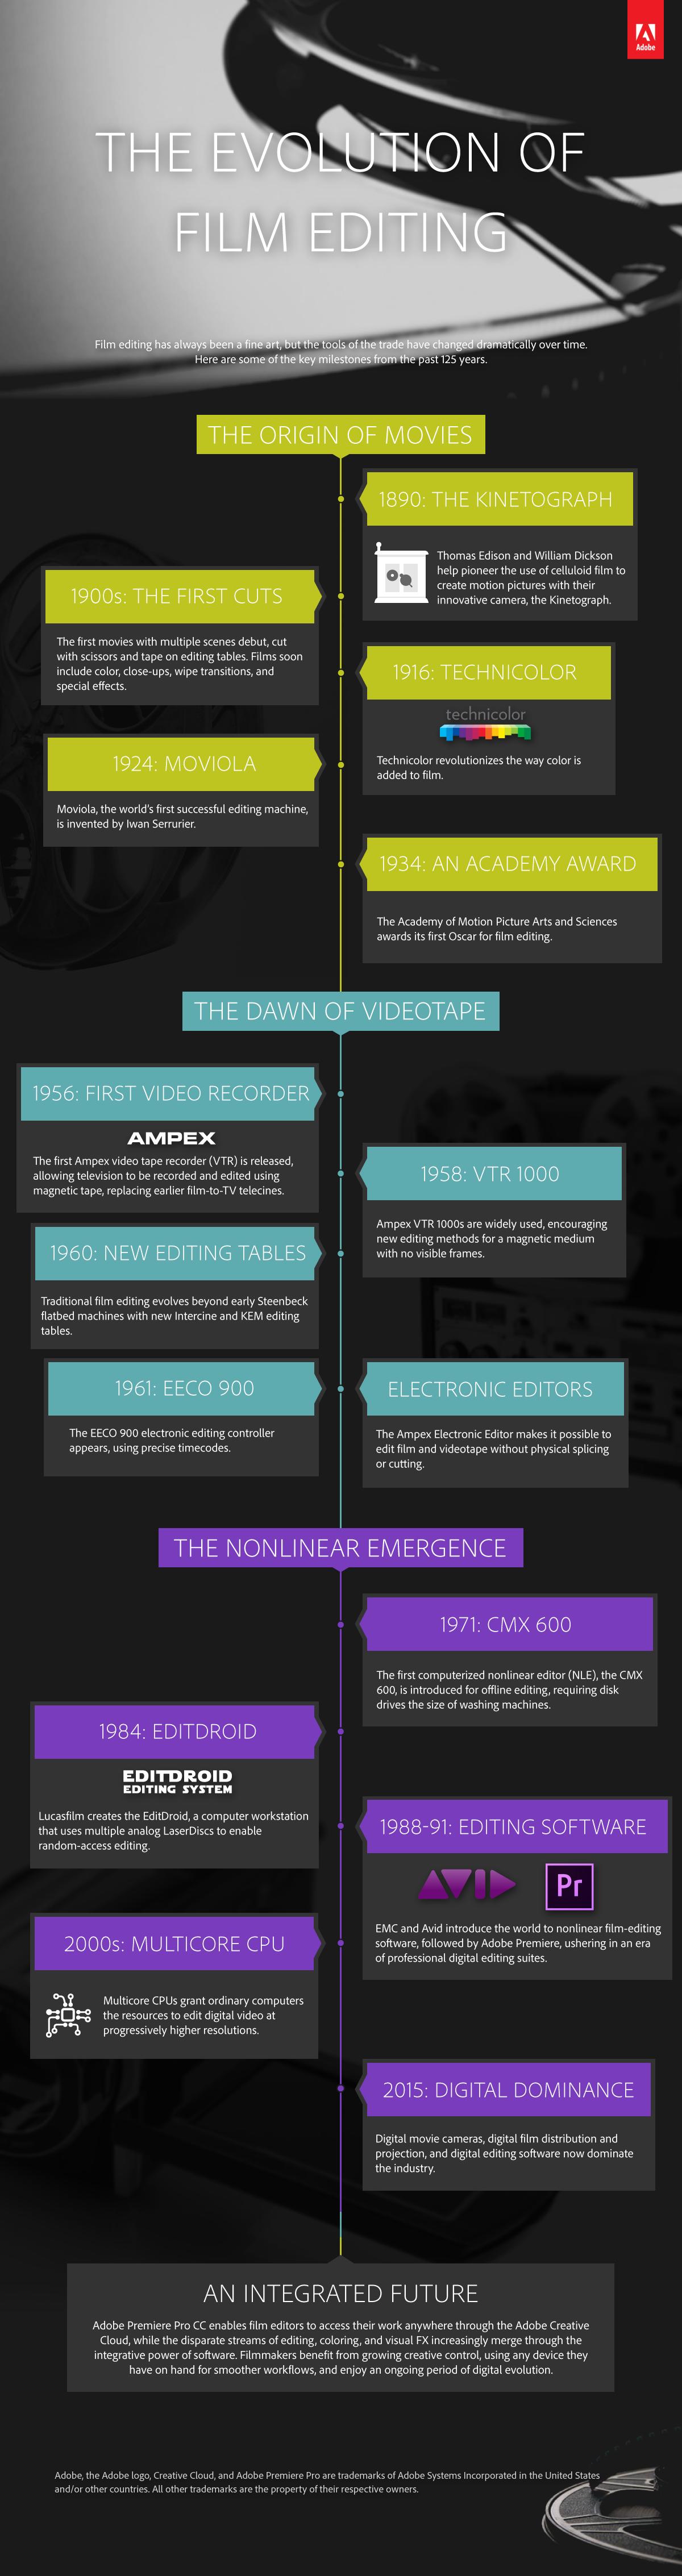 The Evolution of Film Editing 4